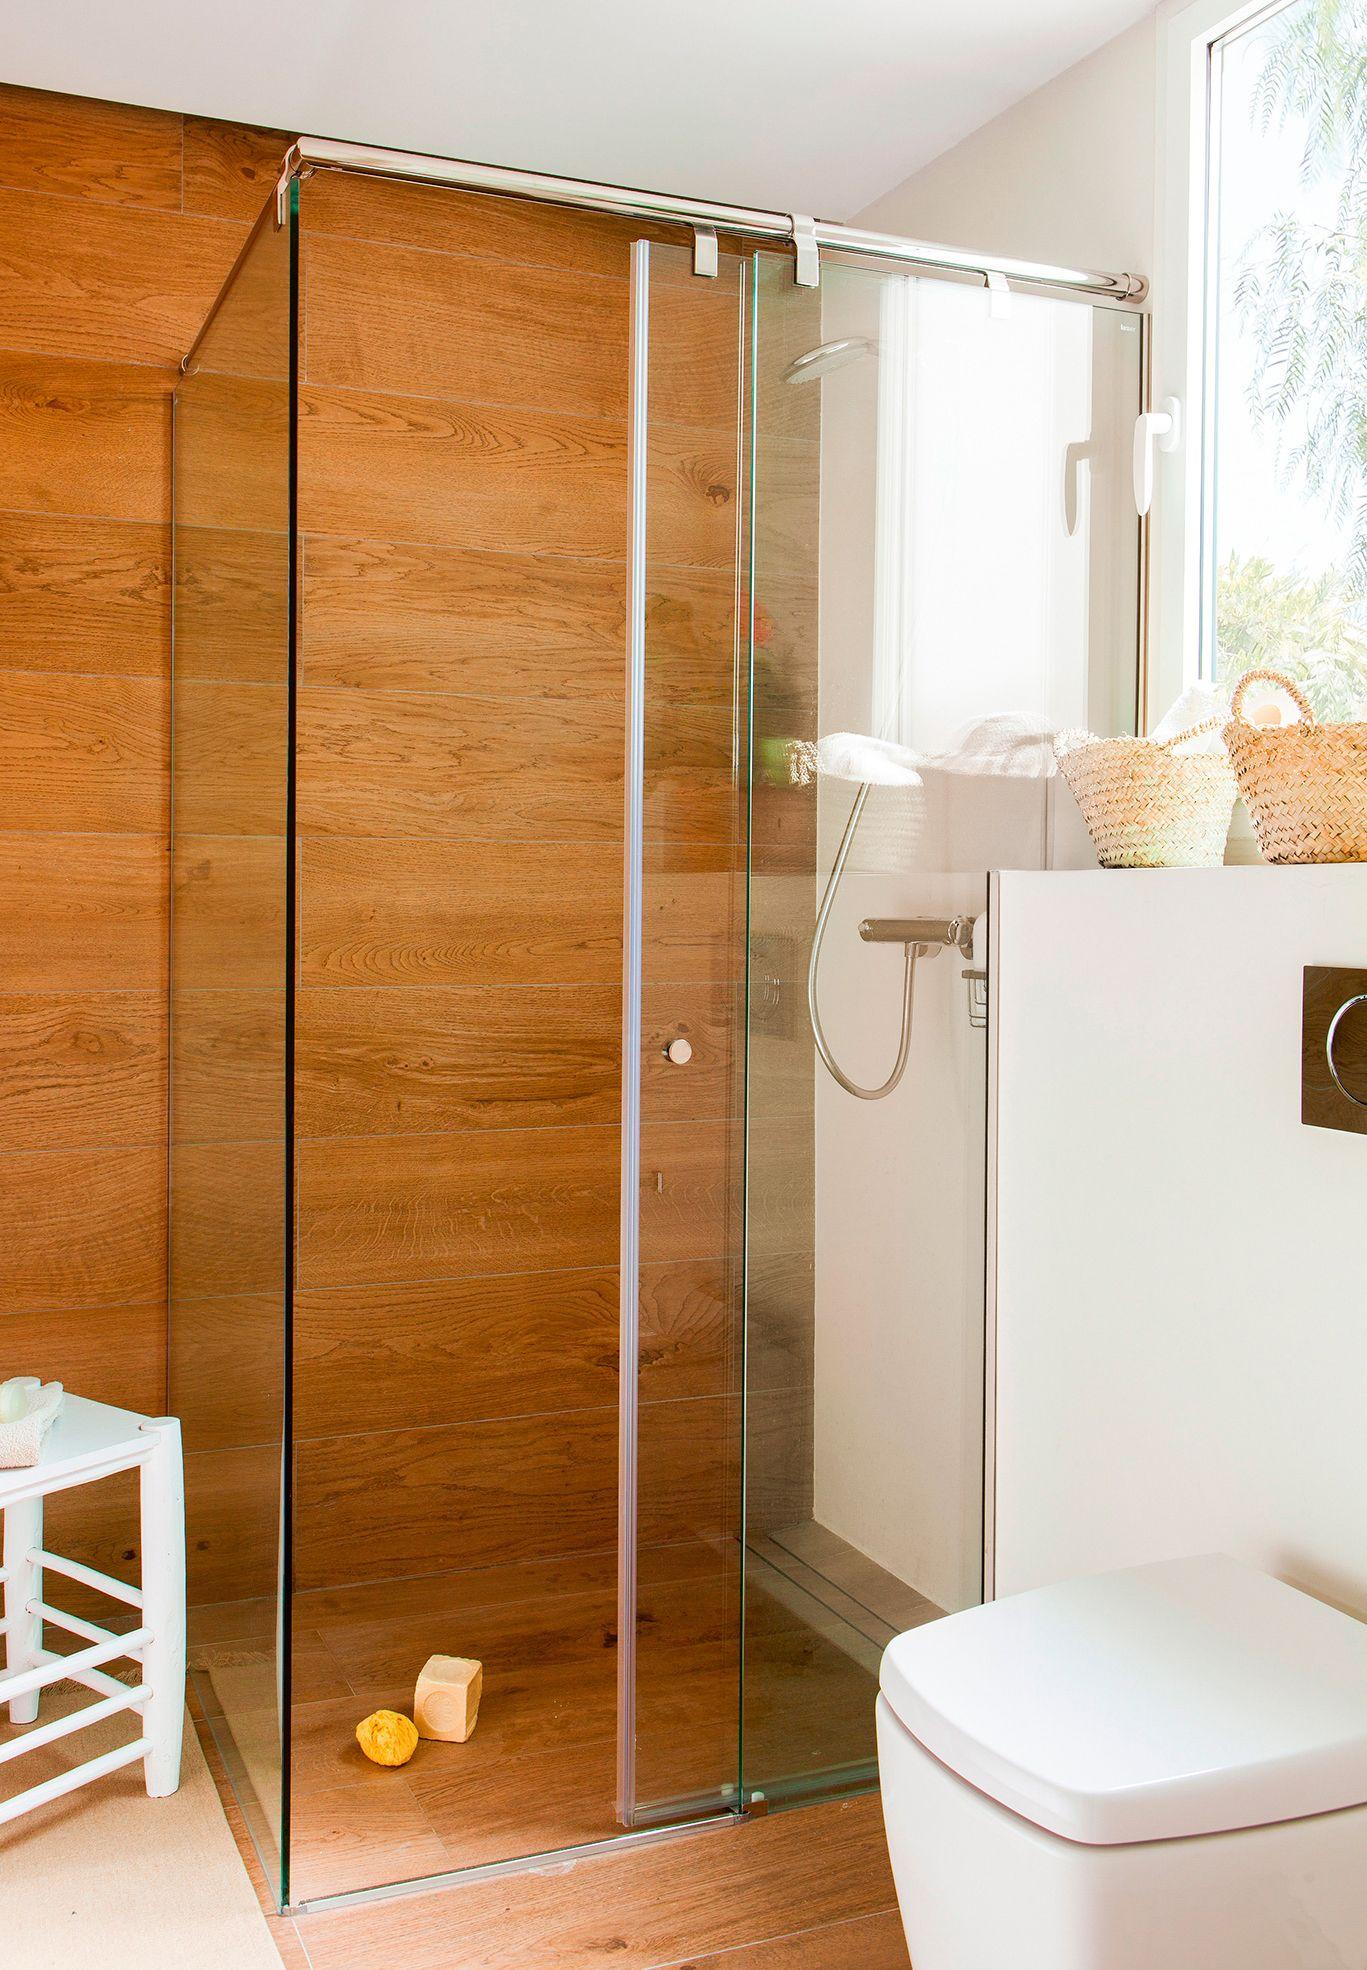 Y seguir creciendo ducha y ba era ba os madera ba os for Banos modernos con banera